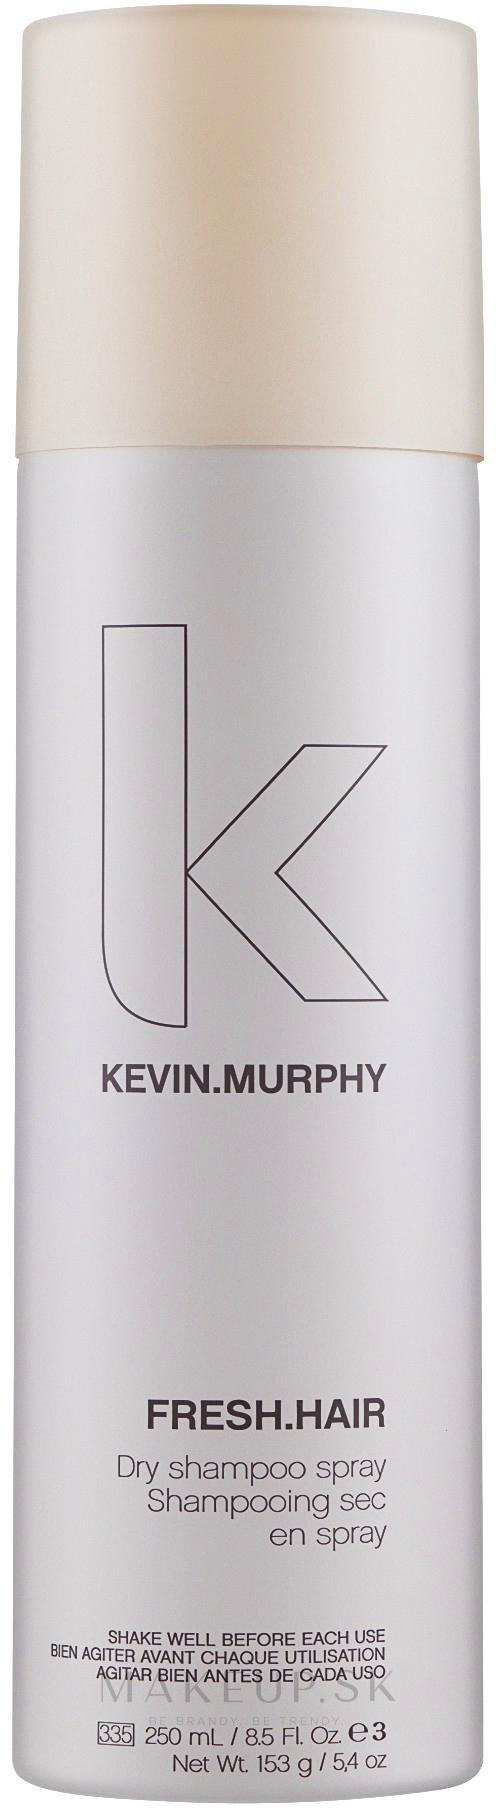 Suchý šampón - Kevin.Murphy Fresh.Hair Dry Cleaning Spray Shampooing — Obrázky 250 ml